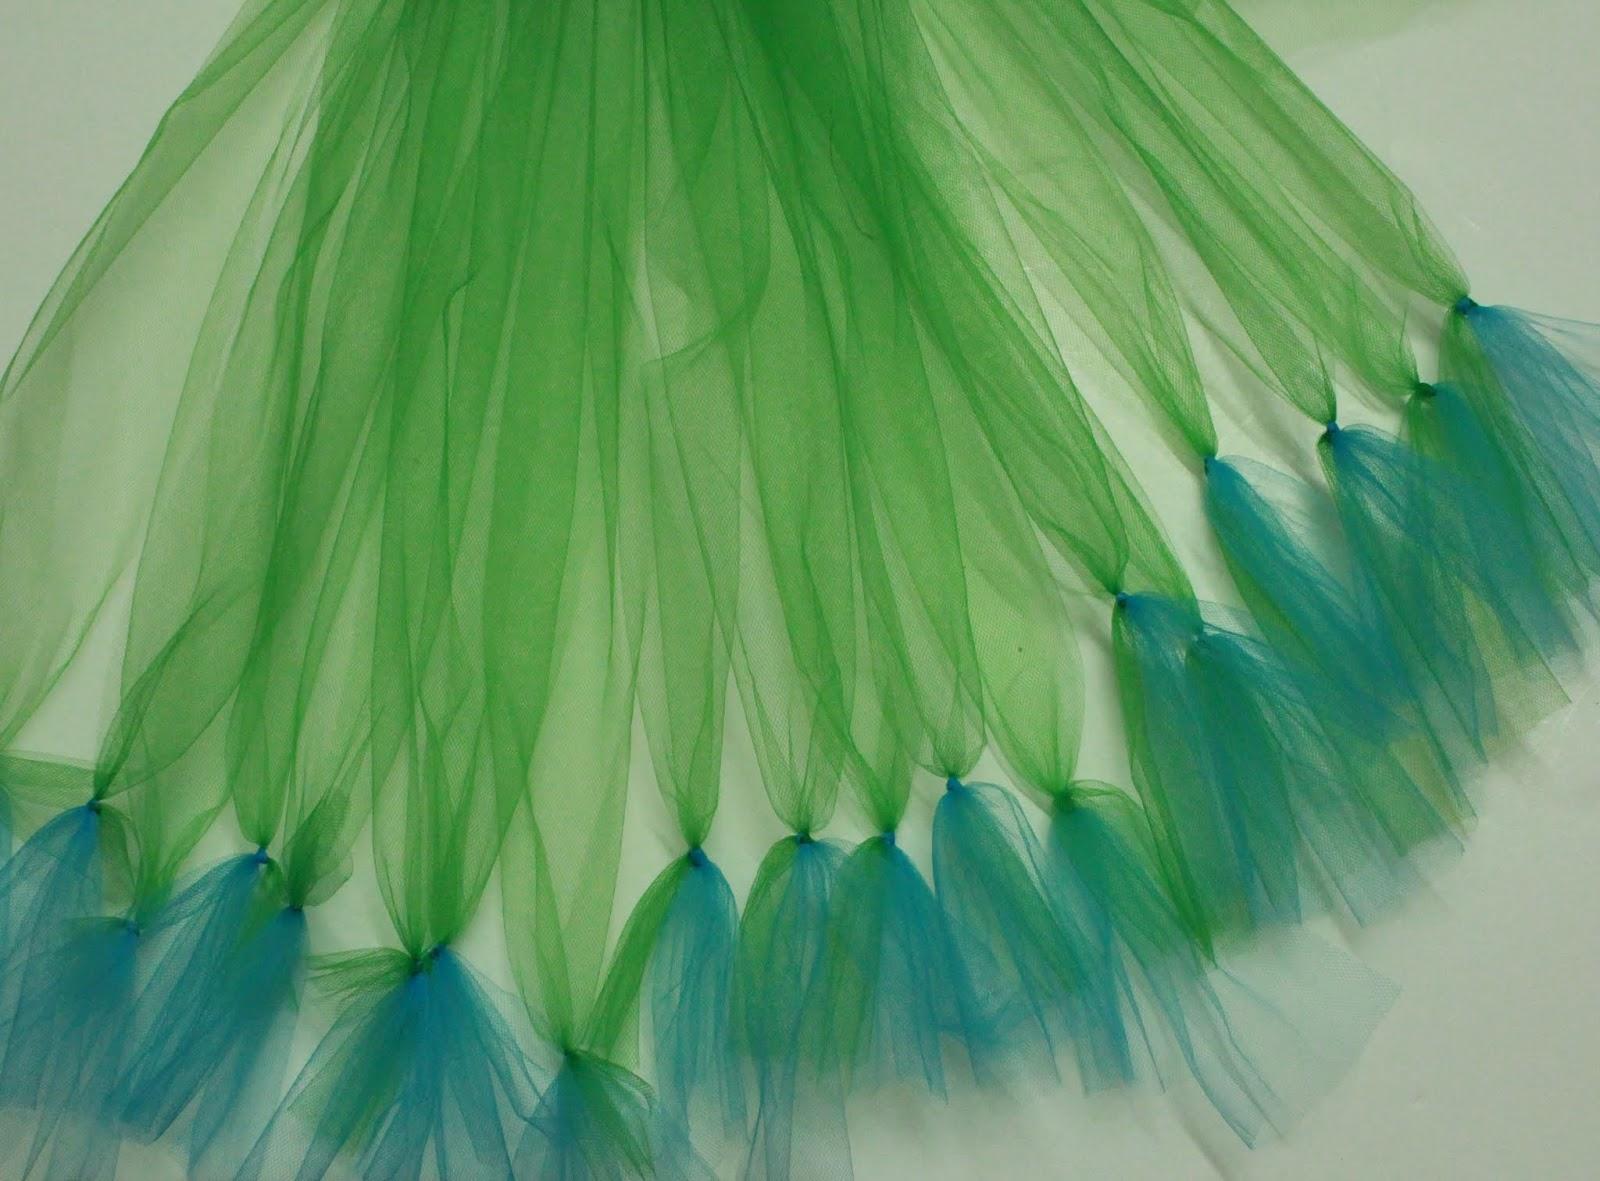 Make a No-Sew Halloween Costume for $20 (Mermaid Princess or Fairy)! - Tatertots and Jello & Make a No-Sew Halloween Costume for $20 (Mermaid Princess or Fairy ...